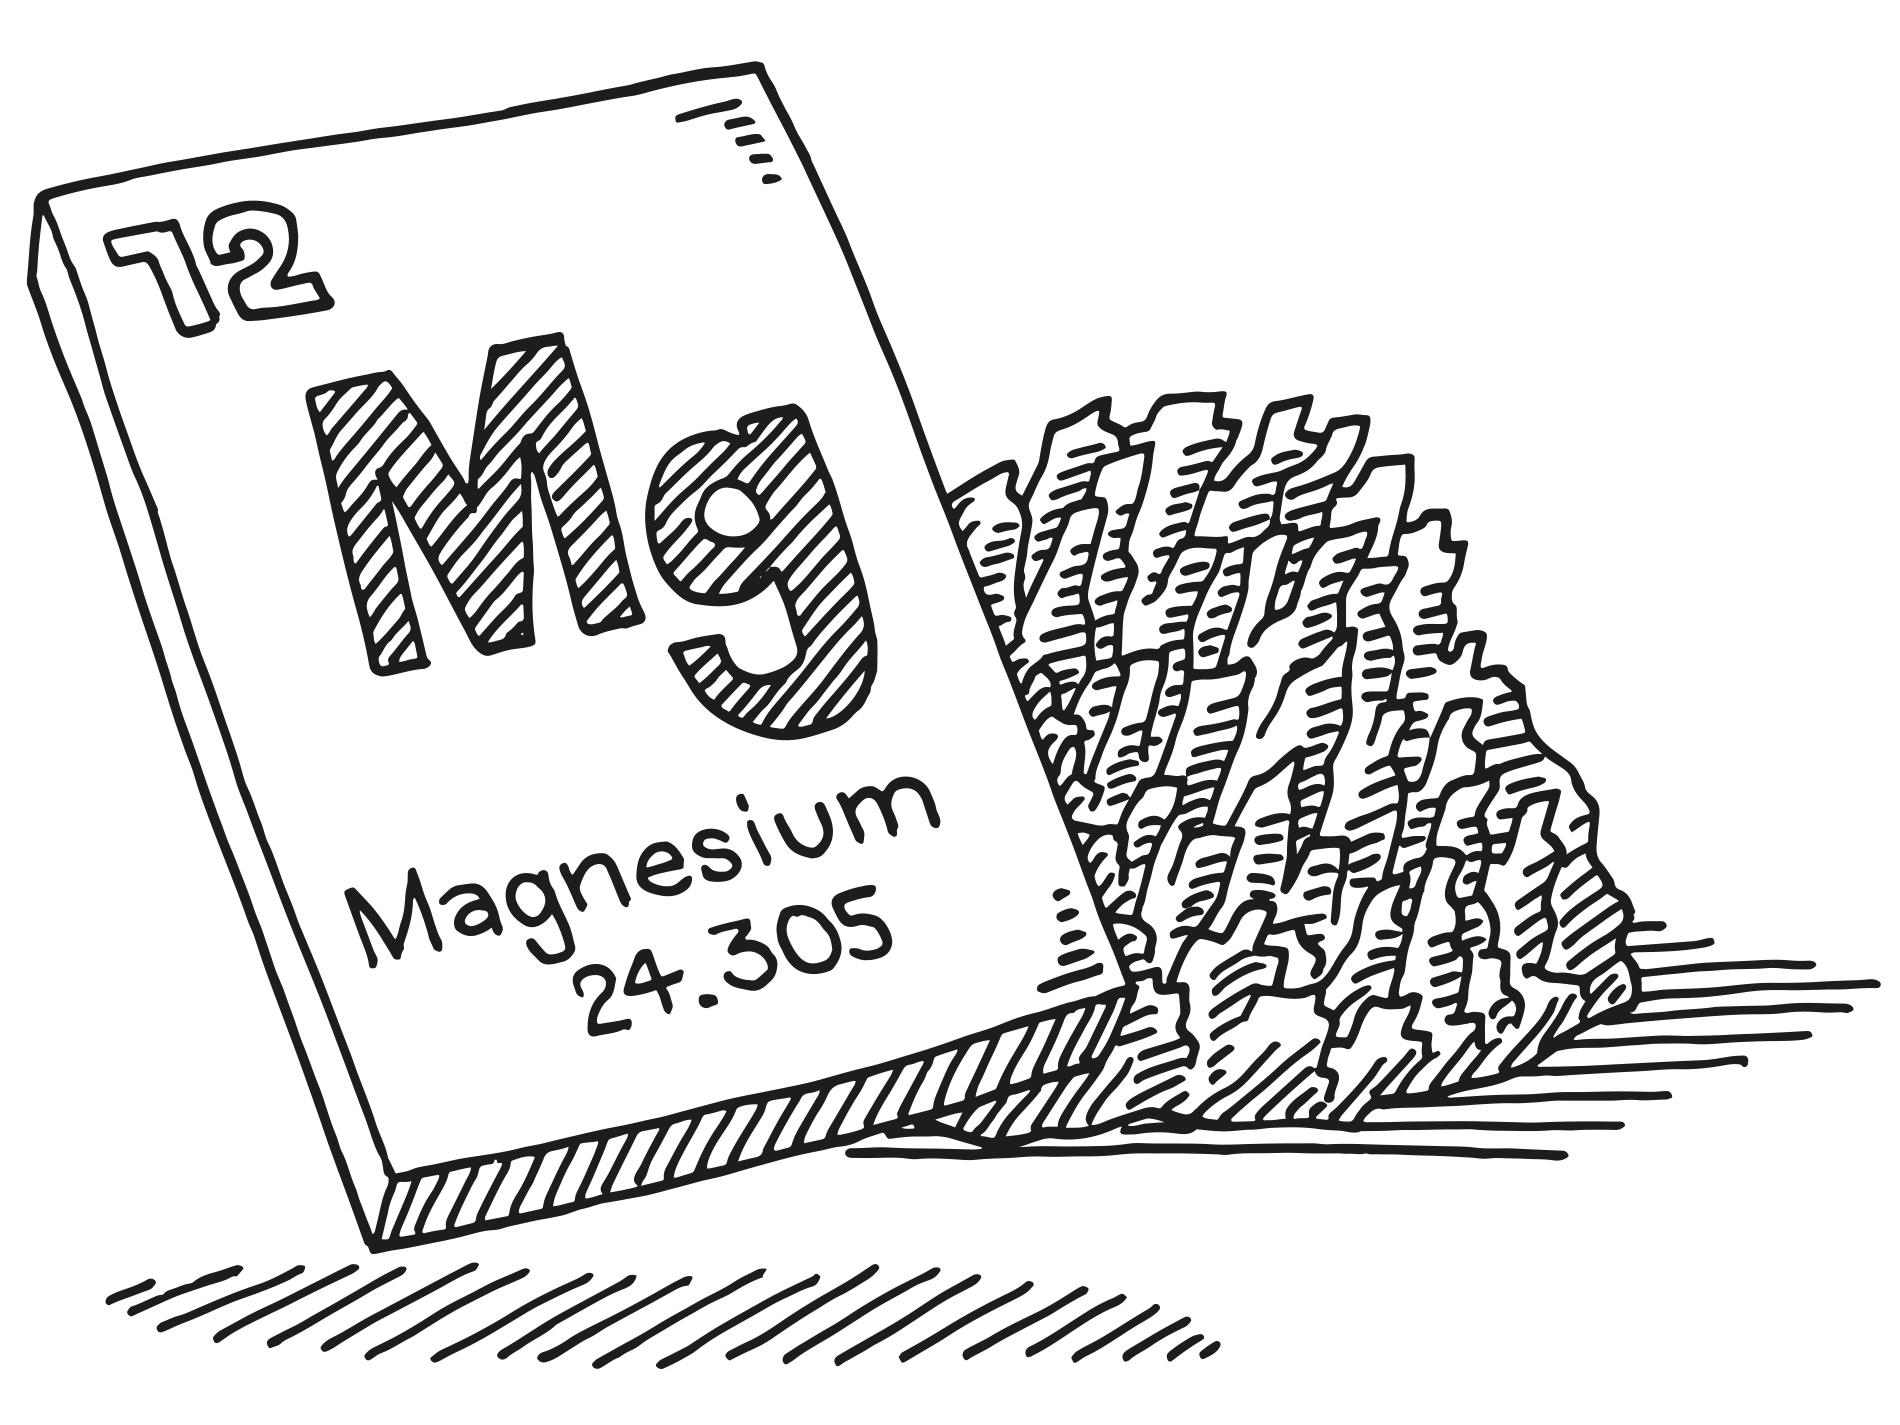 Magnesiummangel trotz hoher Magnesiumwerte im Blut?